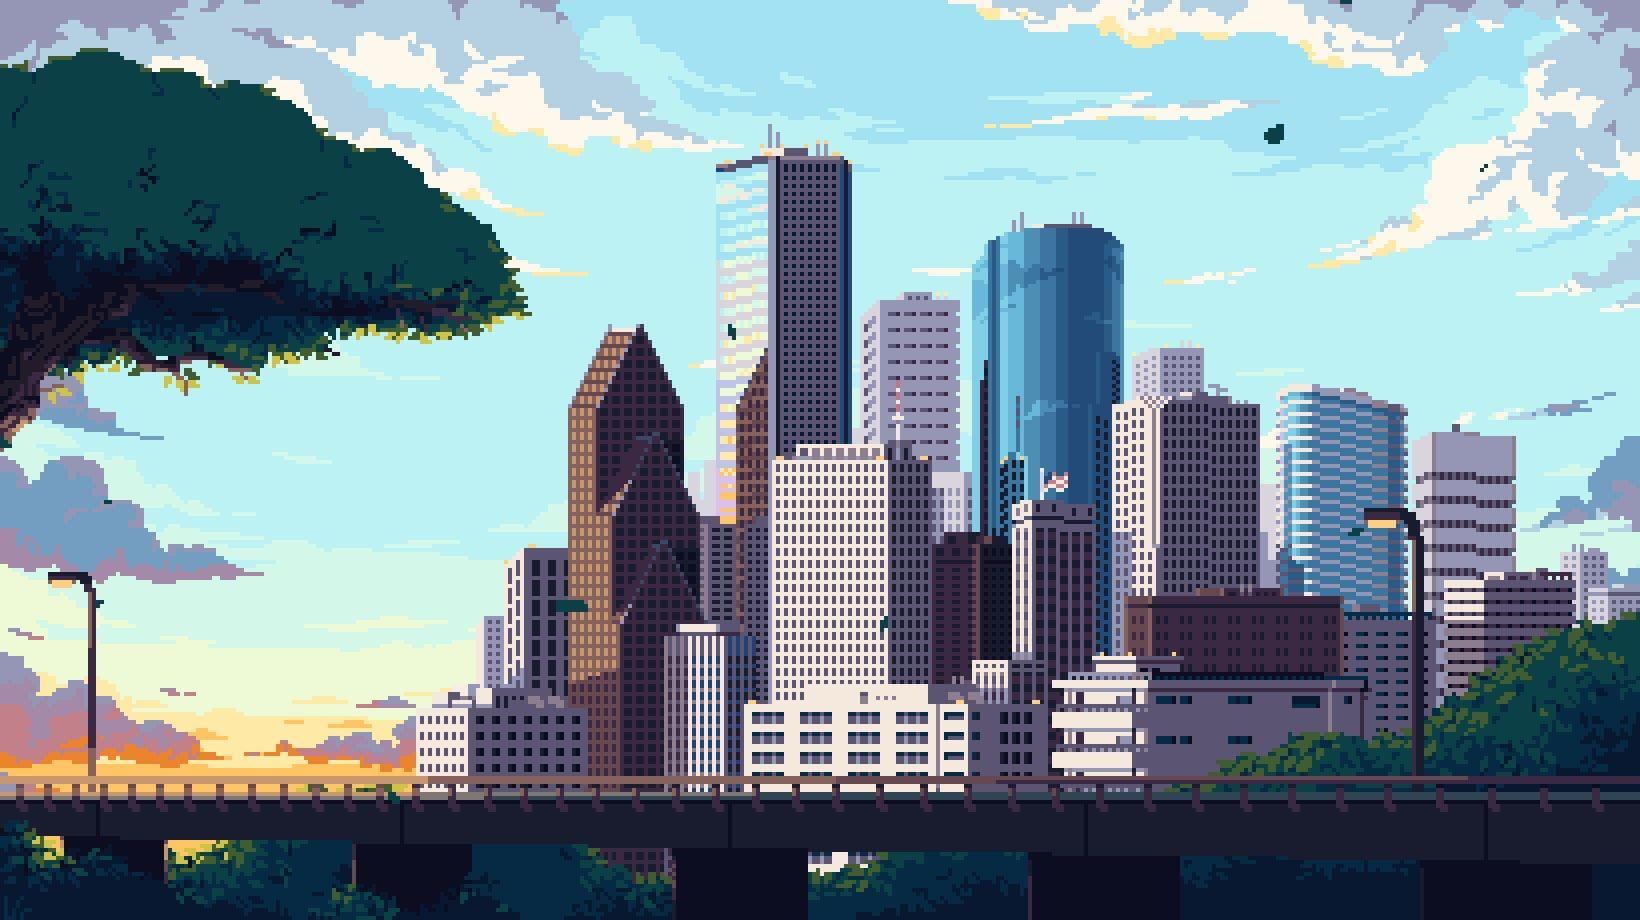 Oc Houston Skyline Animated Pixelart Houston Skyline Skyline Painting Pixel Art